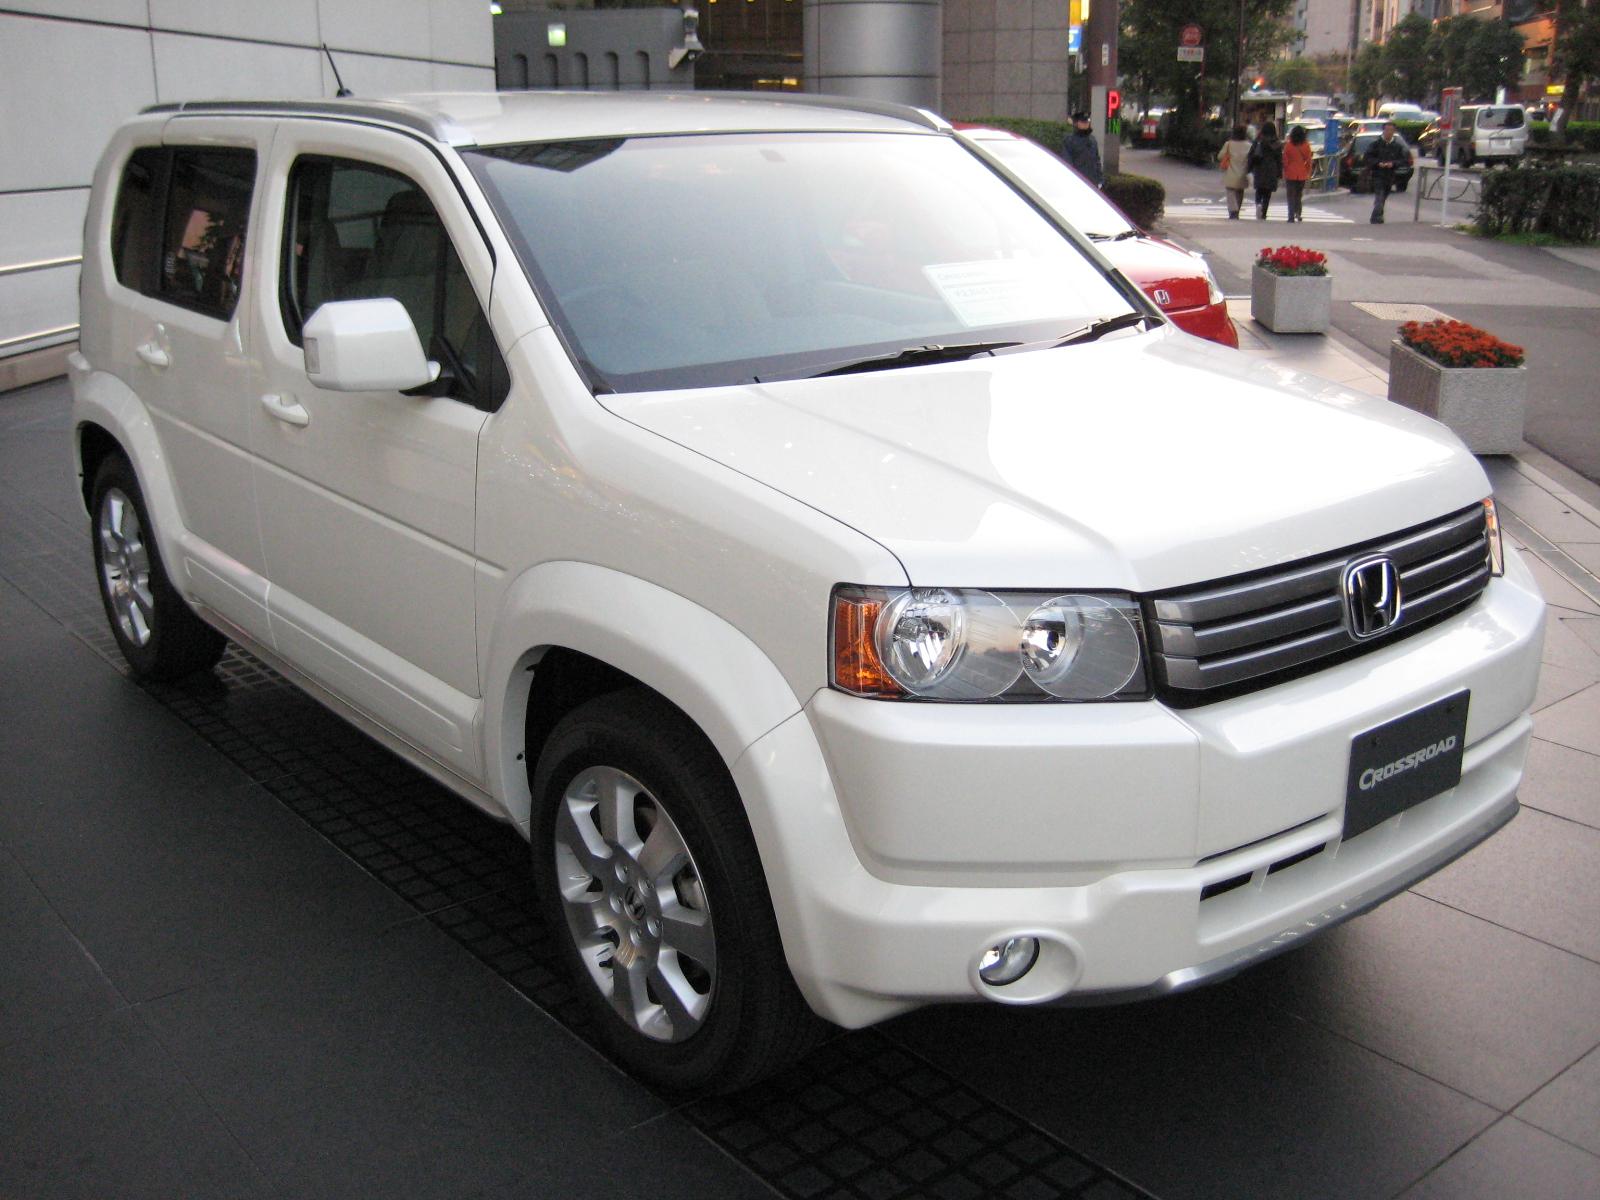 File:2007 Honda Crossroad 01.JPG - Wikimedia Commons